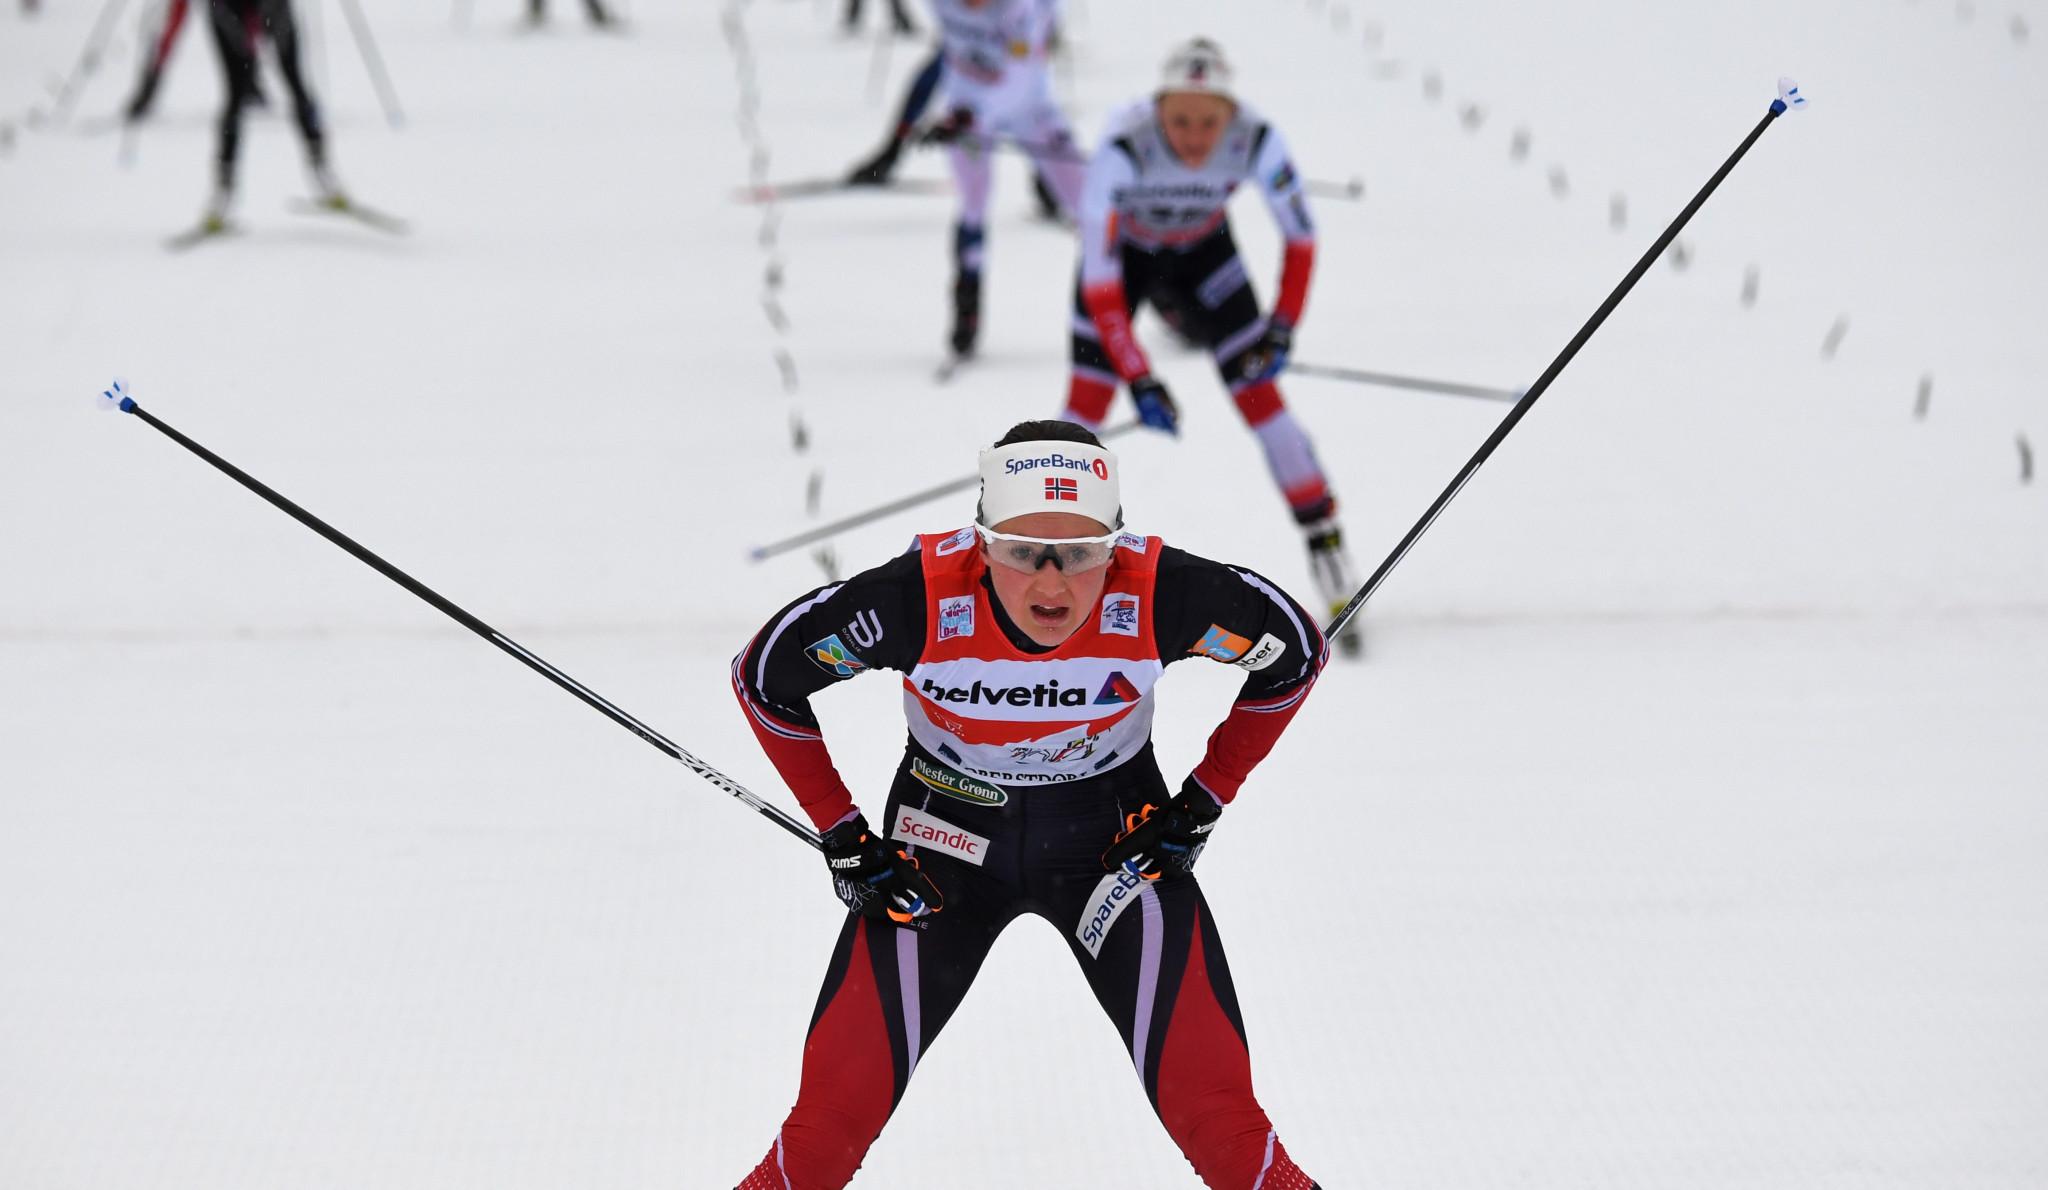 Østberg and Iversen secure Norwegian double as Tour de Ski resumes